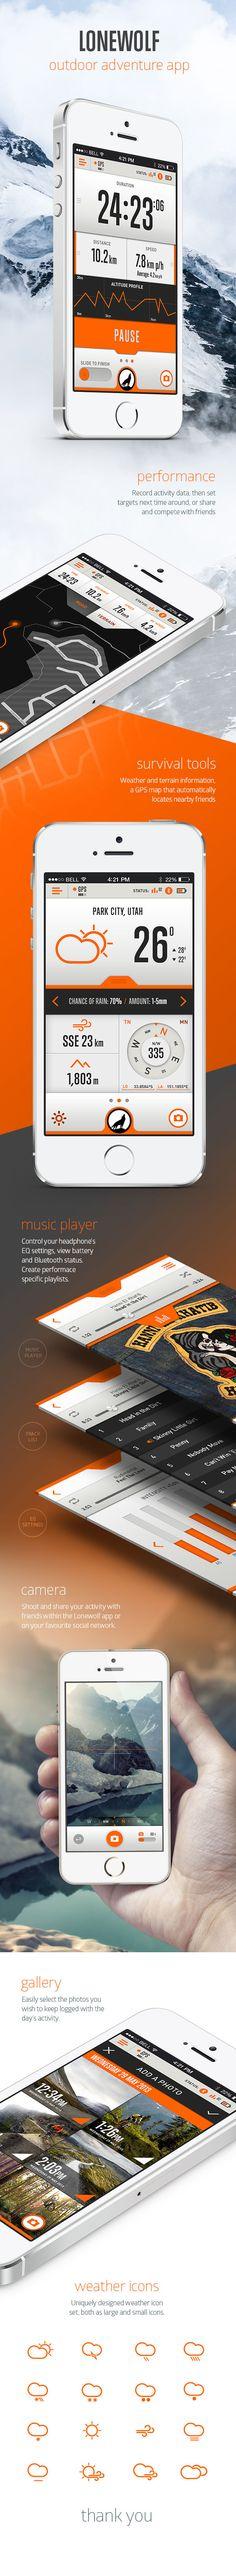 Lonewolf by Stephen Busuttil, via Behance - Dude the compass. Mobile Application Design, Mobile Web Design, Web Ui Design, Wireframe, Apps, App Design Inspiration, Design Ideas, User Interface Design, Sport Outdoor